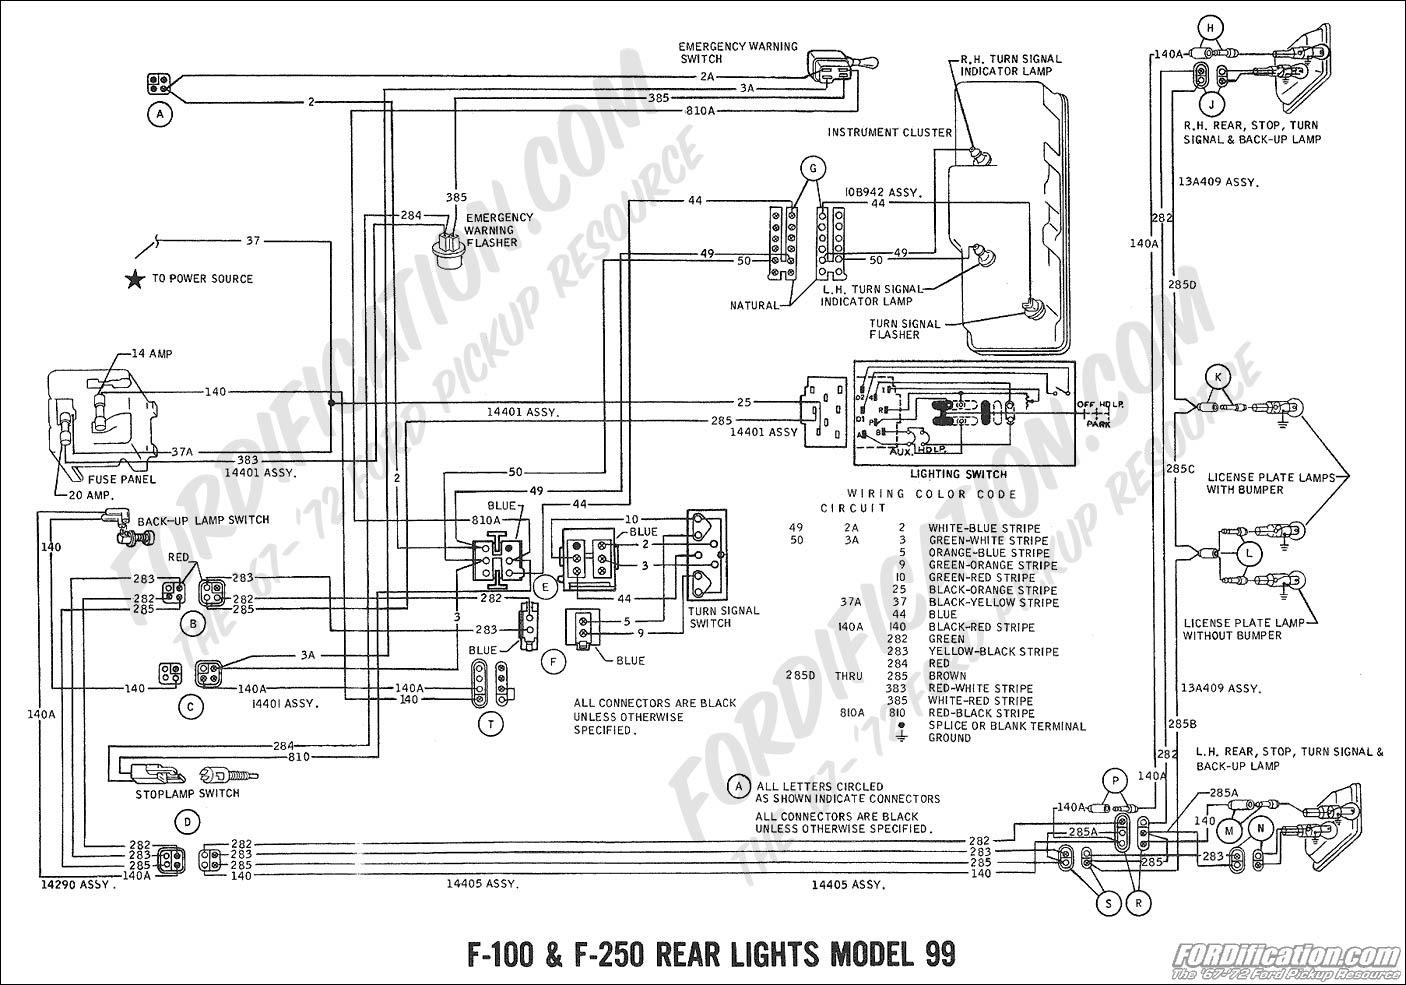 remote starter wiring diagram for 2015 mazda 3 free download image 2